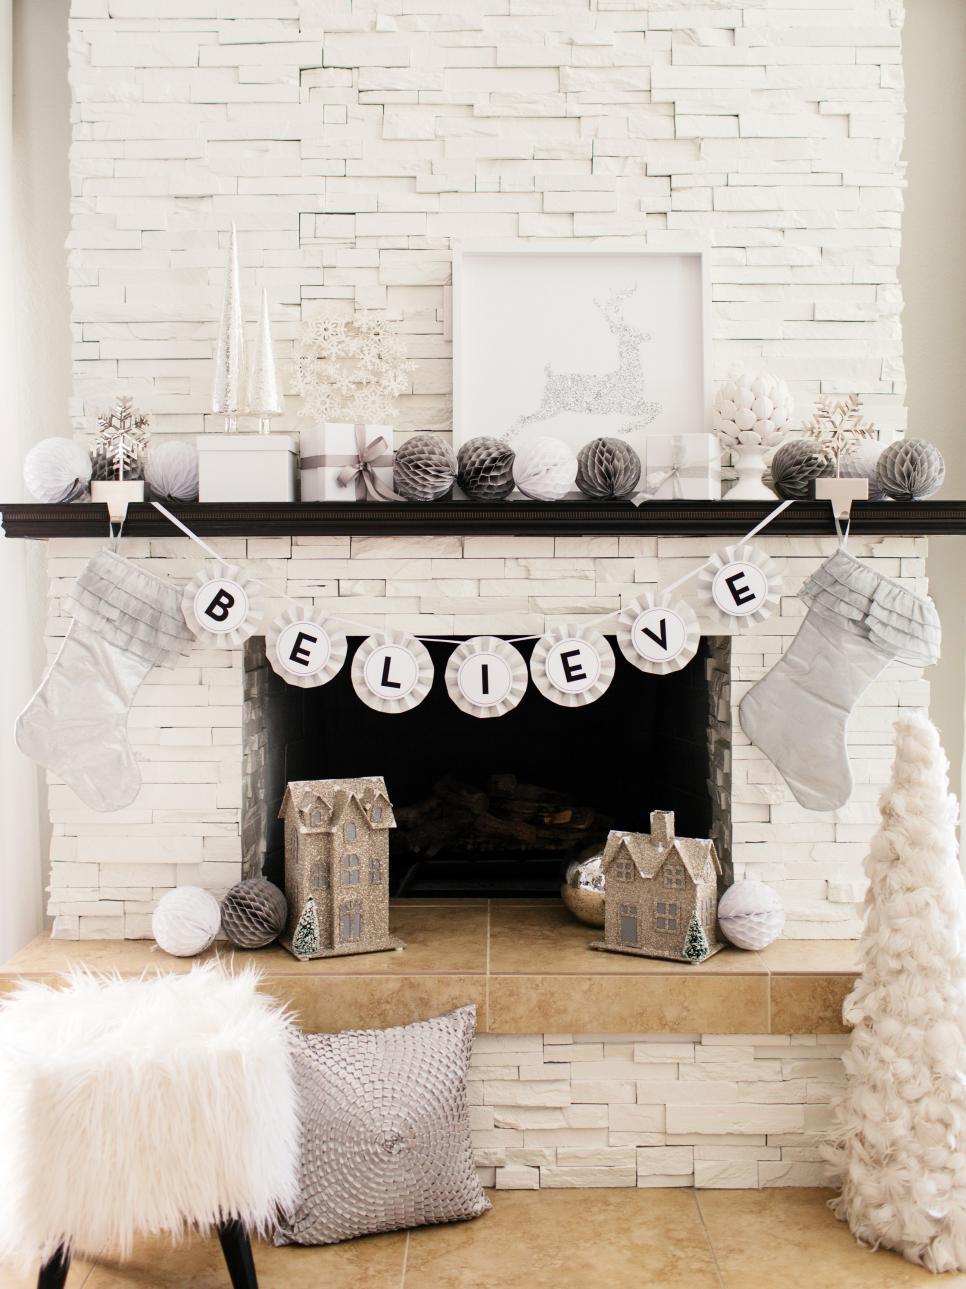 Beautiful Christmas Mantel Decor you will love - Hypnoz Glam